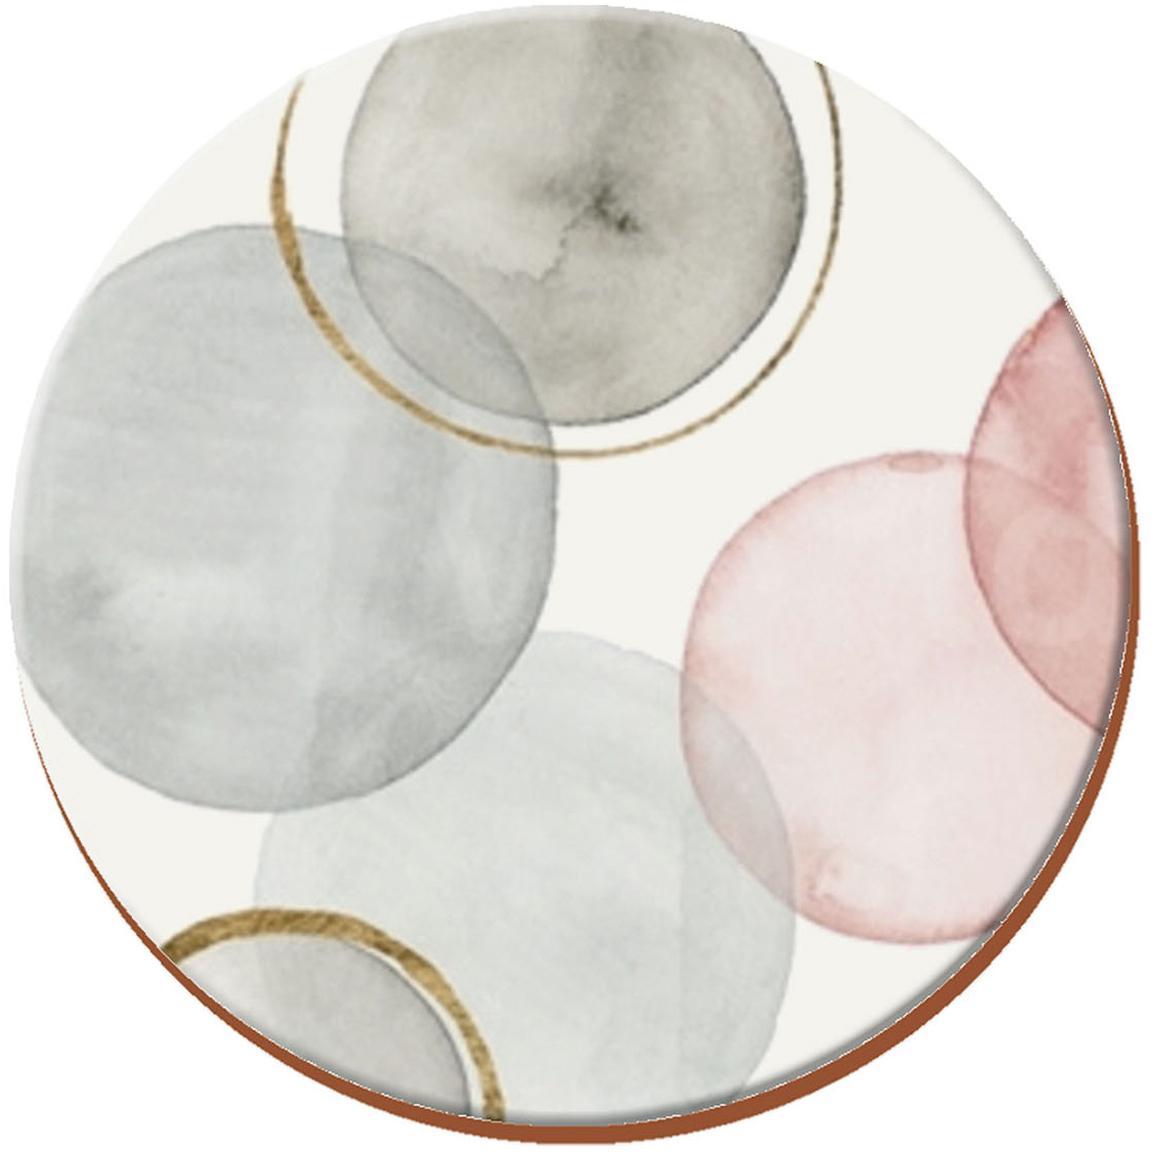 Posavasos Gilded Spheres, 4uds., Corcho, Blanco,gris, rosa, Ø 12 cm